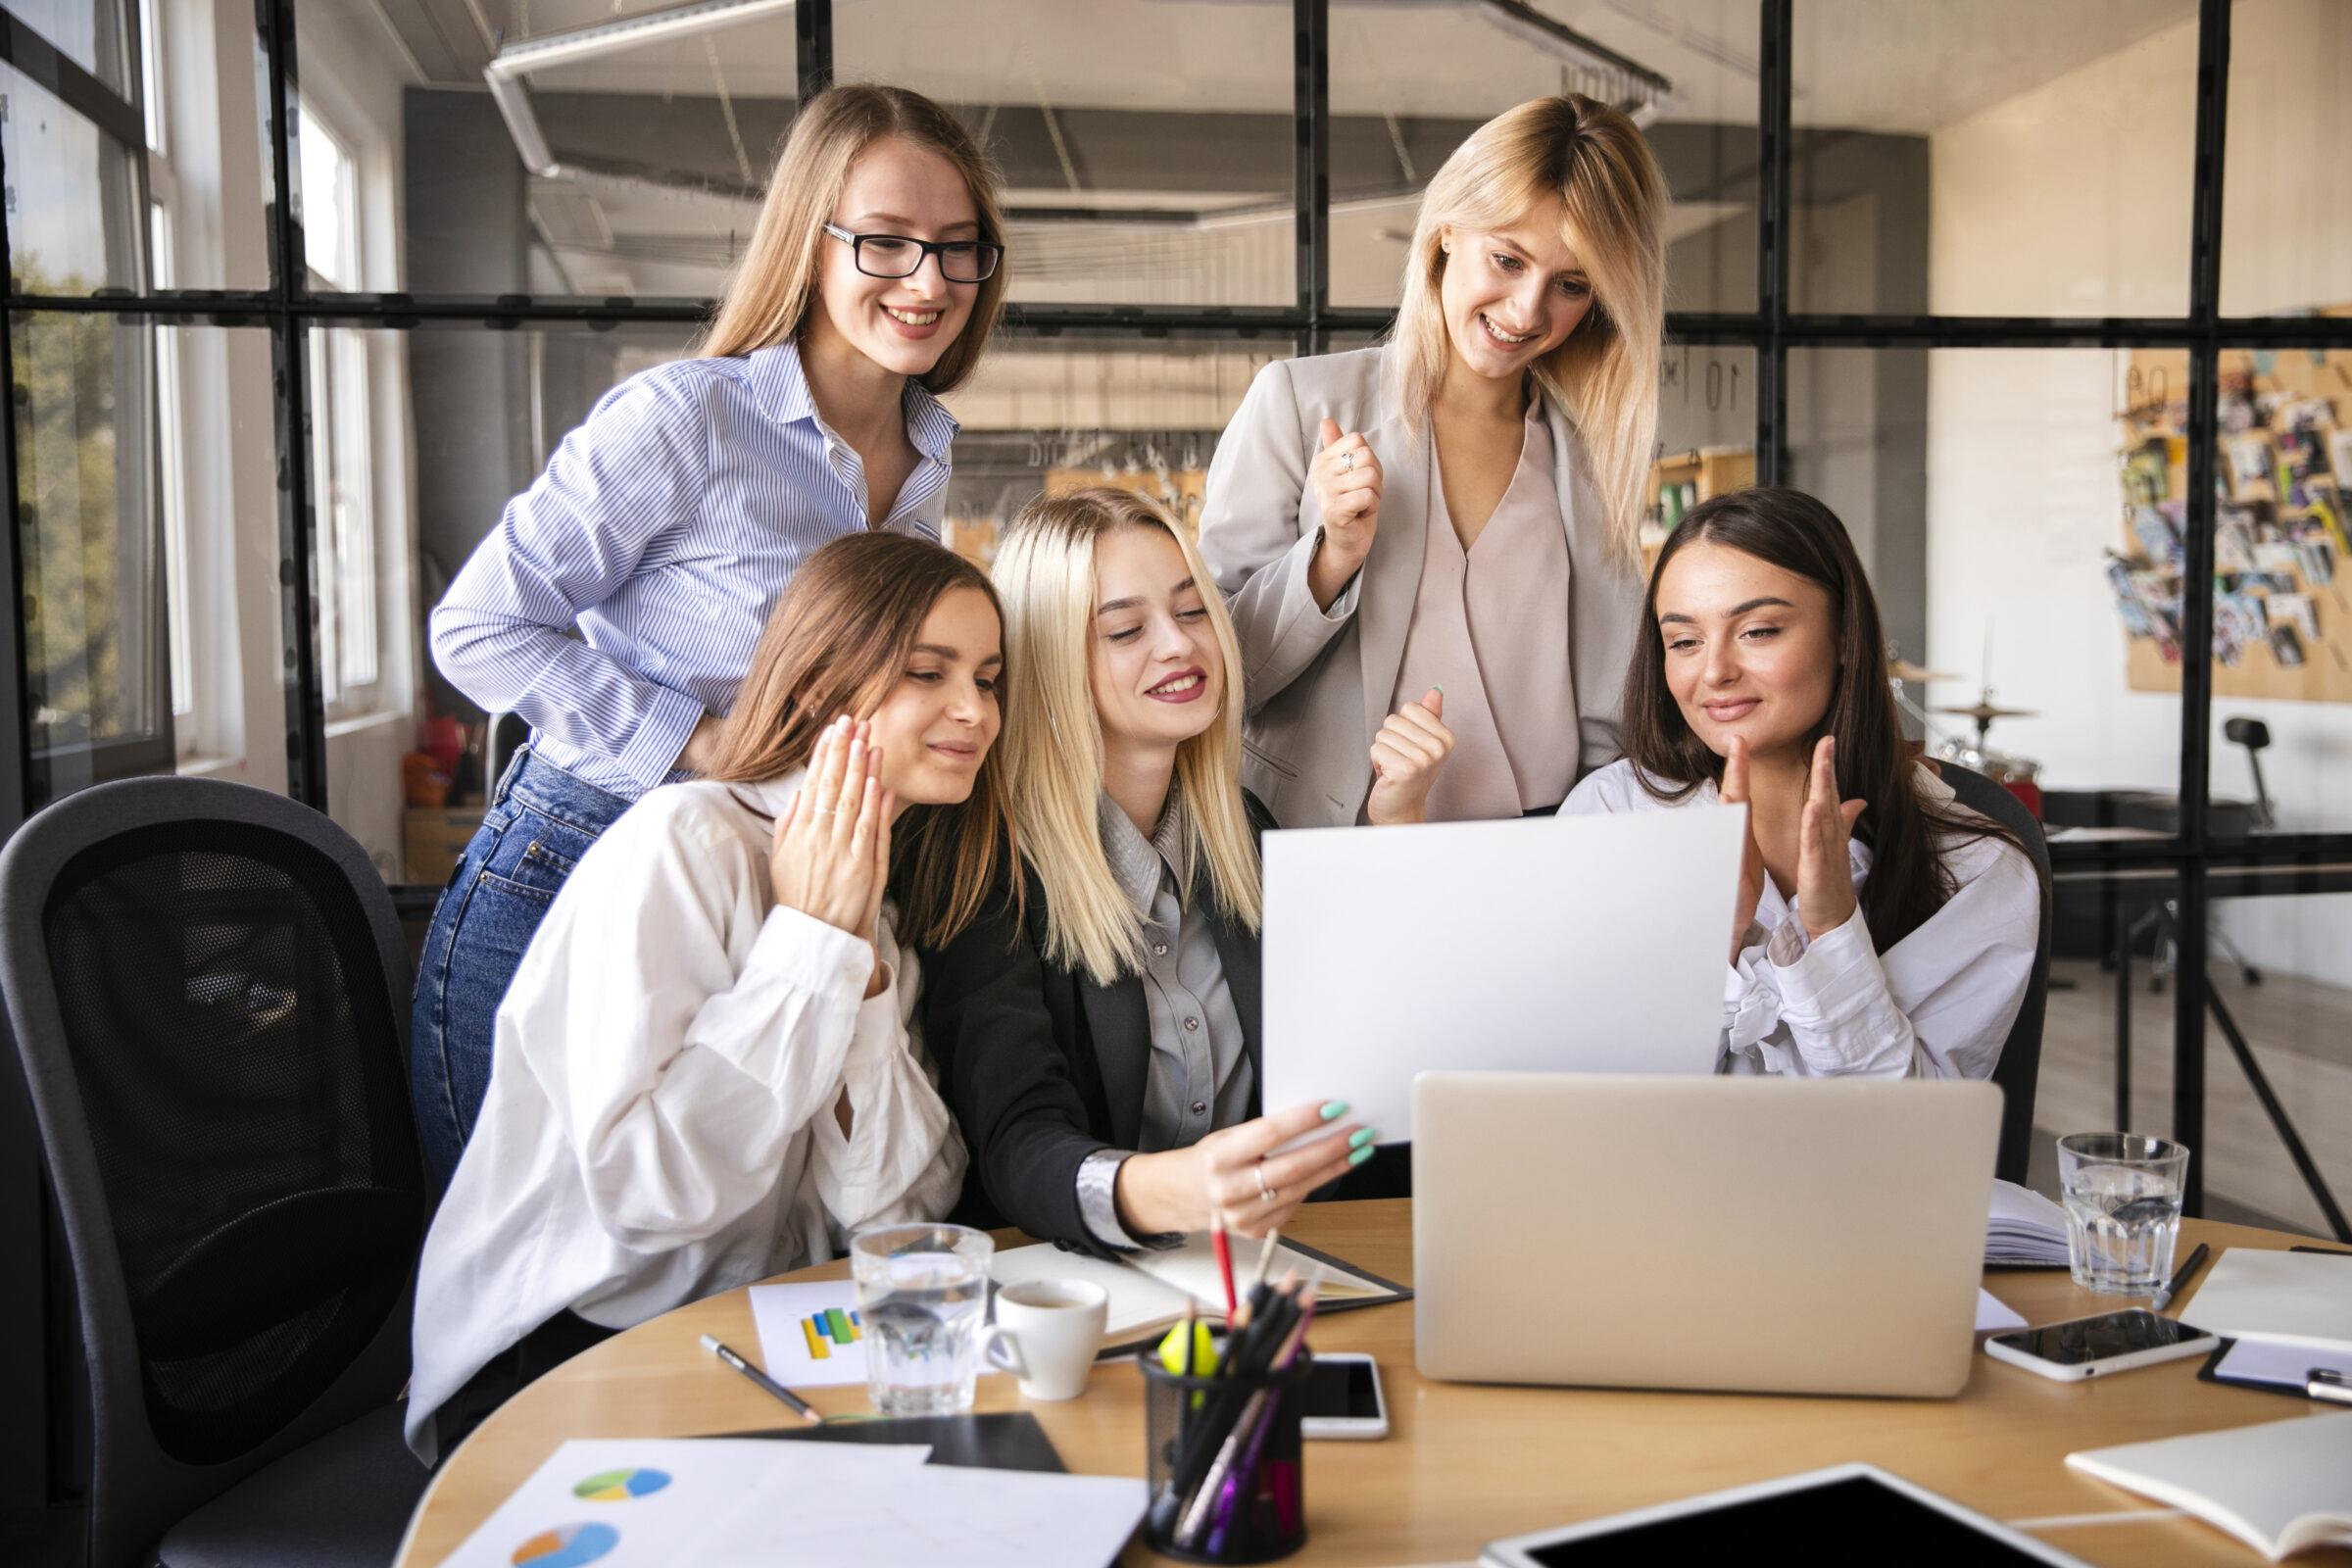 Equipe de mulheres trabalhando 3 Desperta Debora